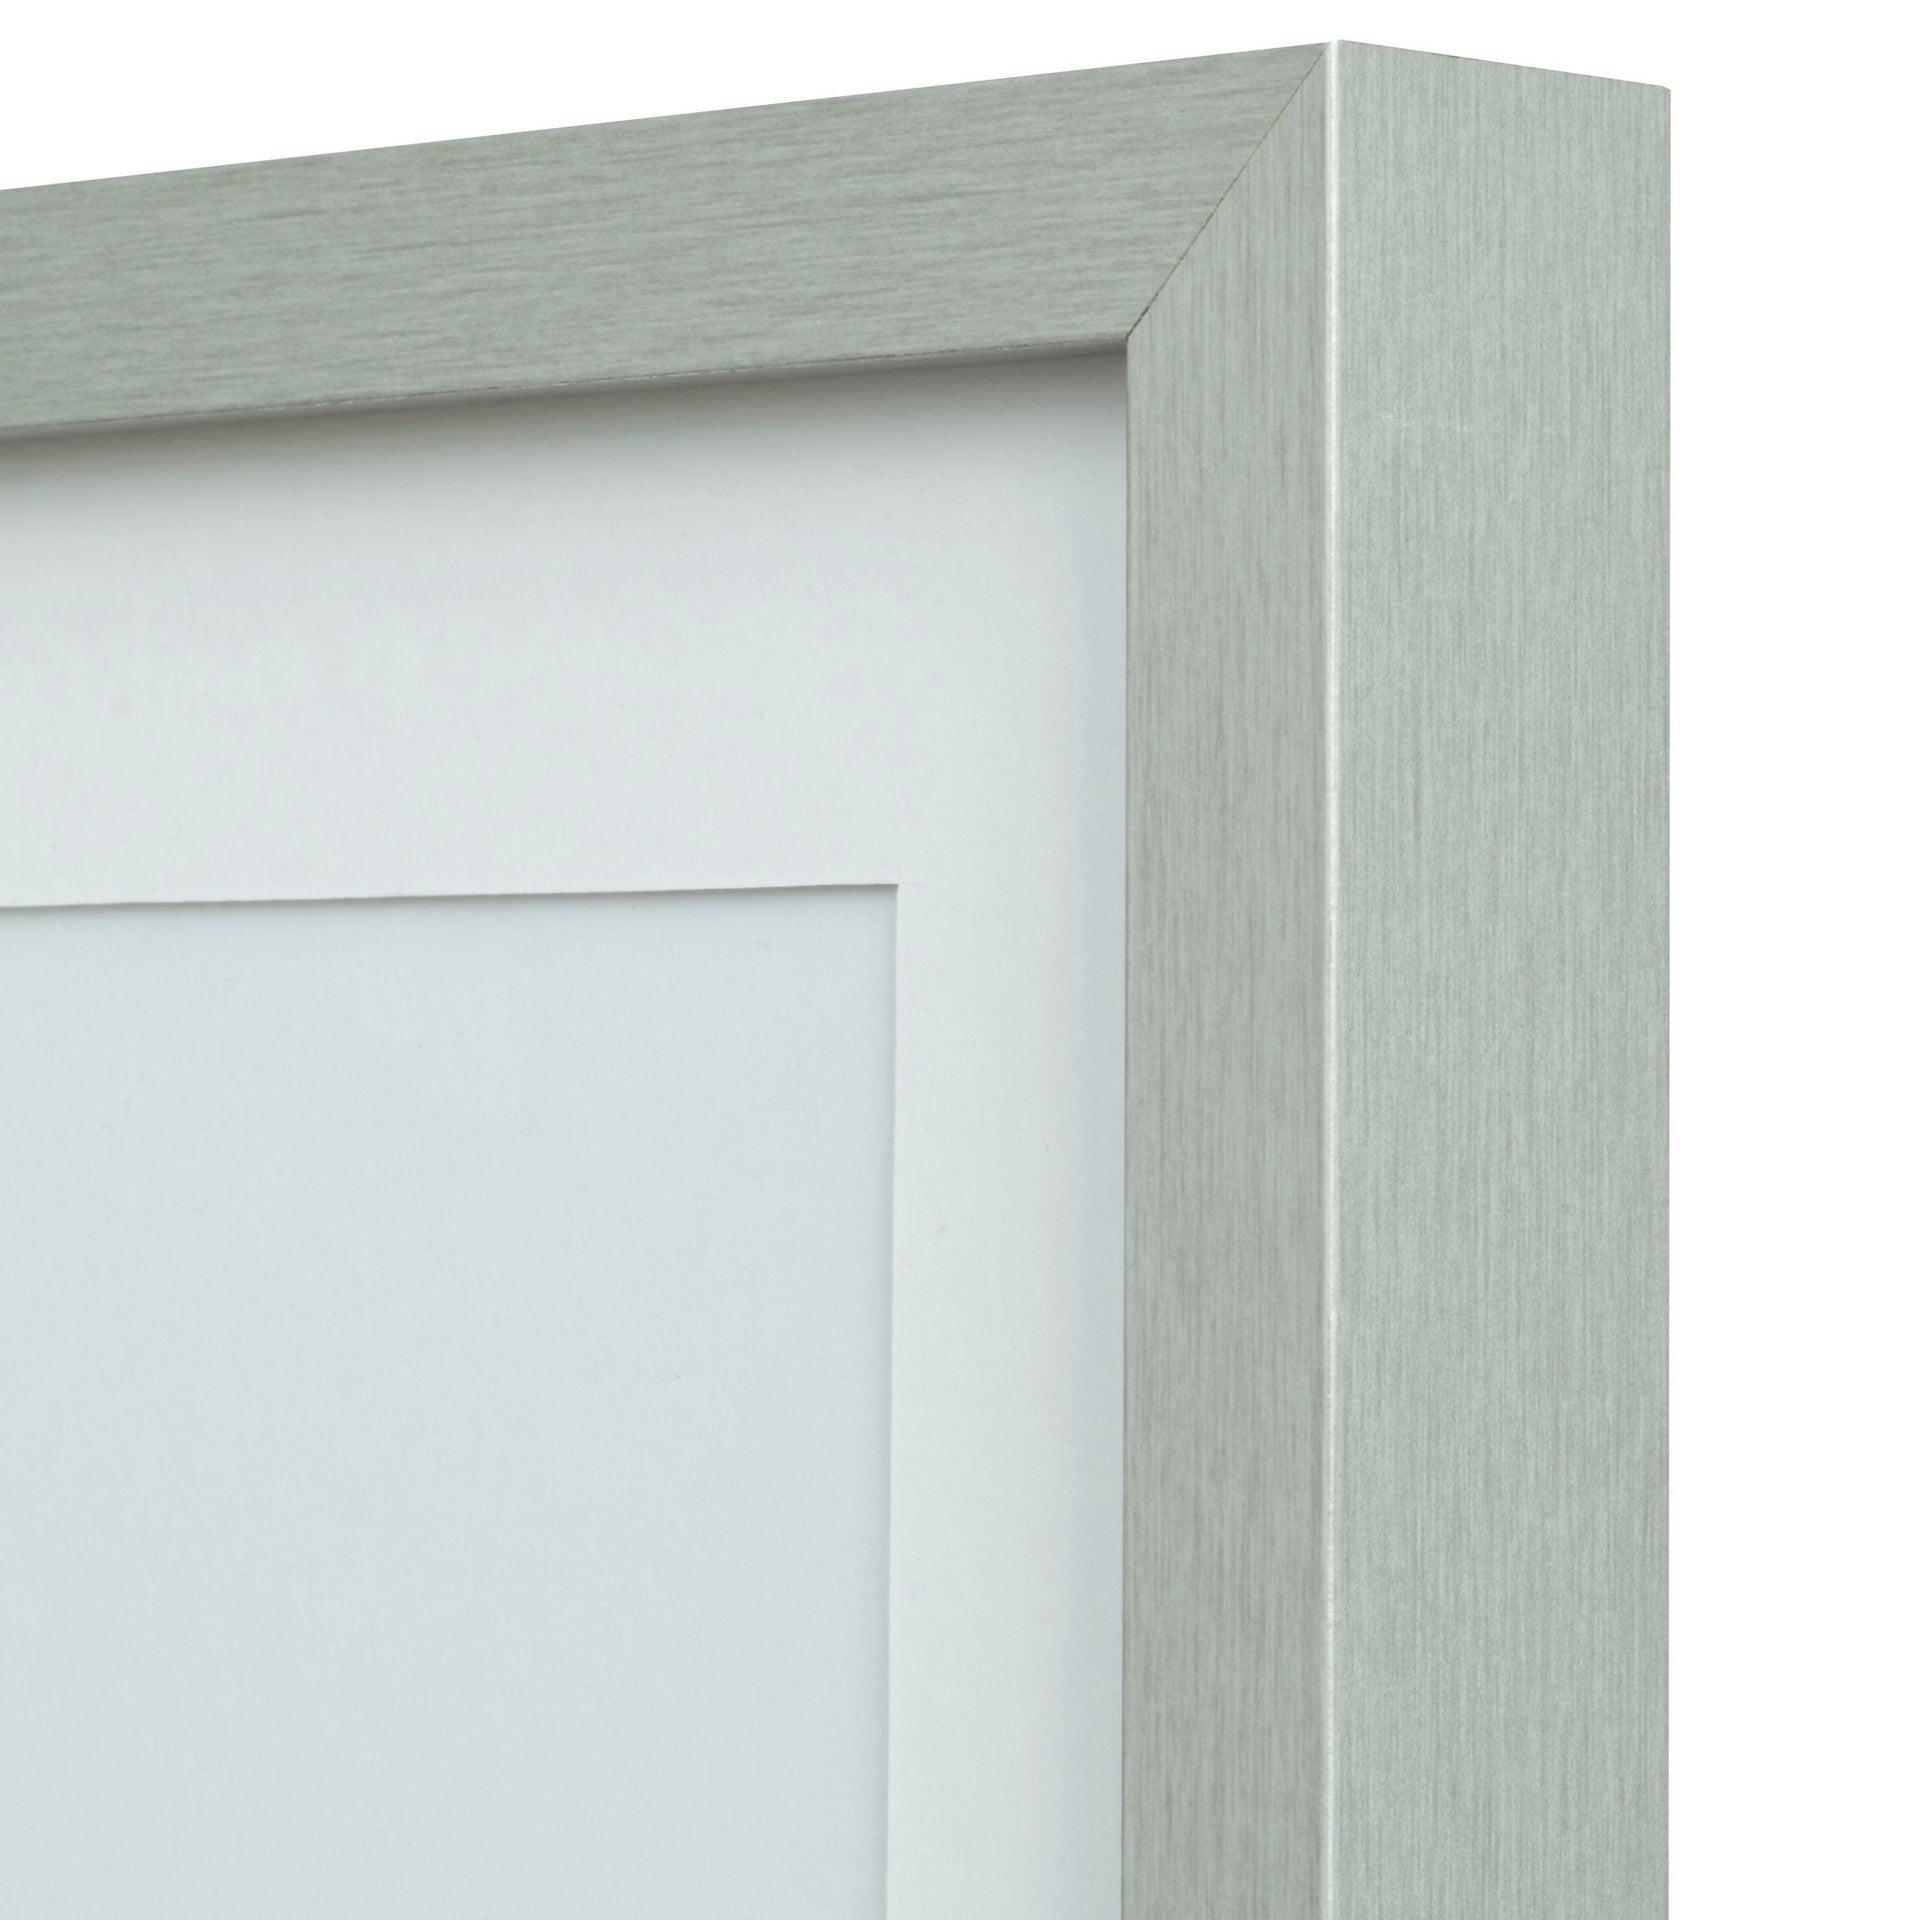 Cornice con passe-partout Inspire milo argento 40x50 cm - 1